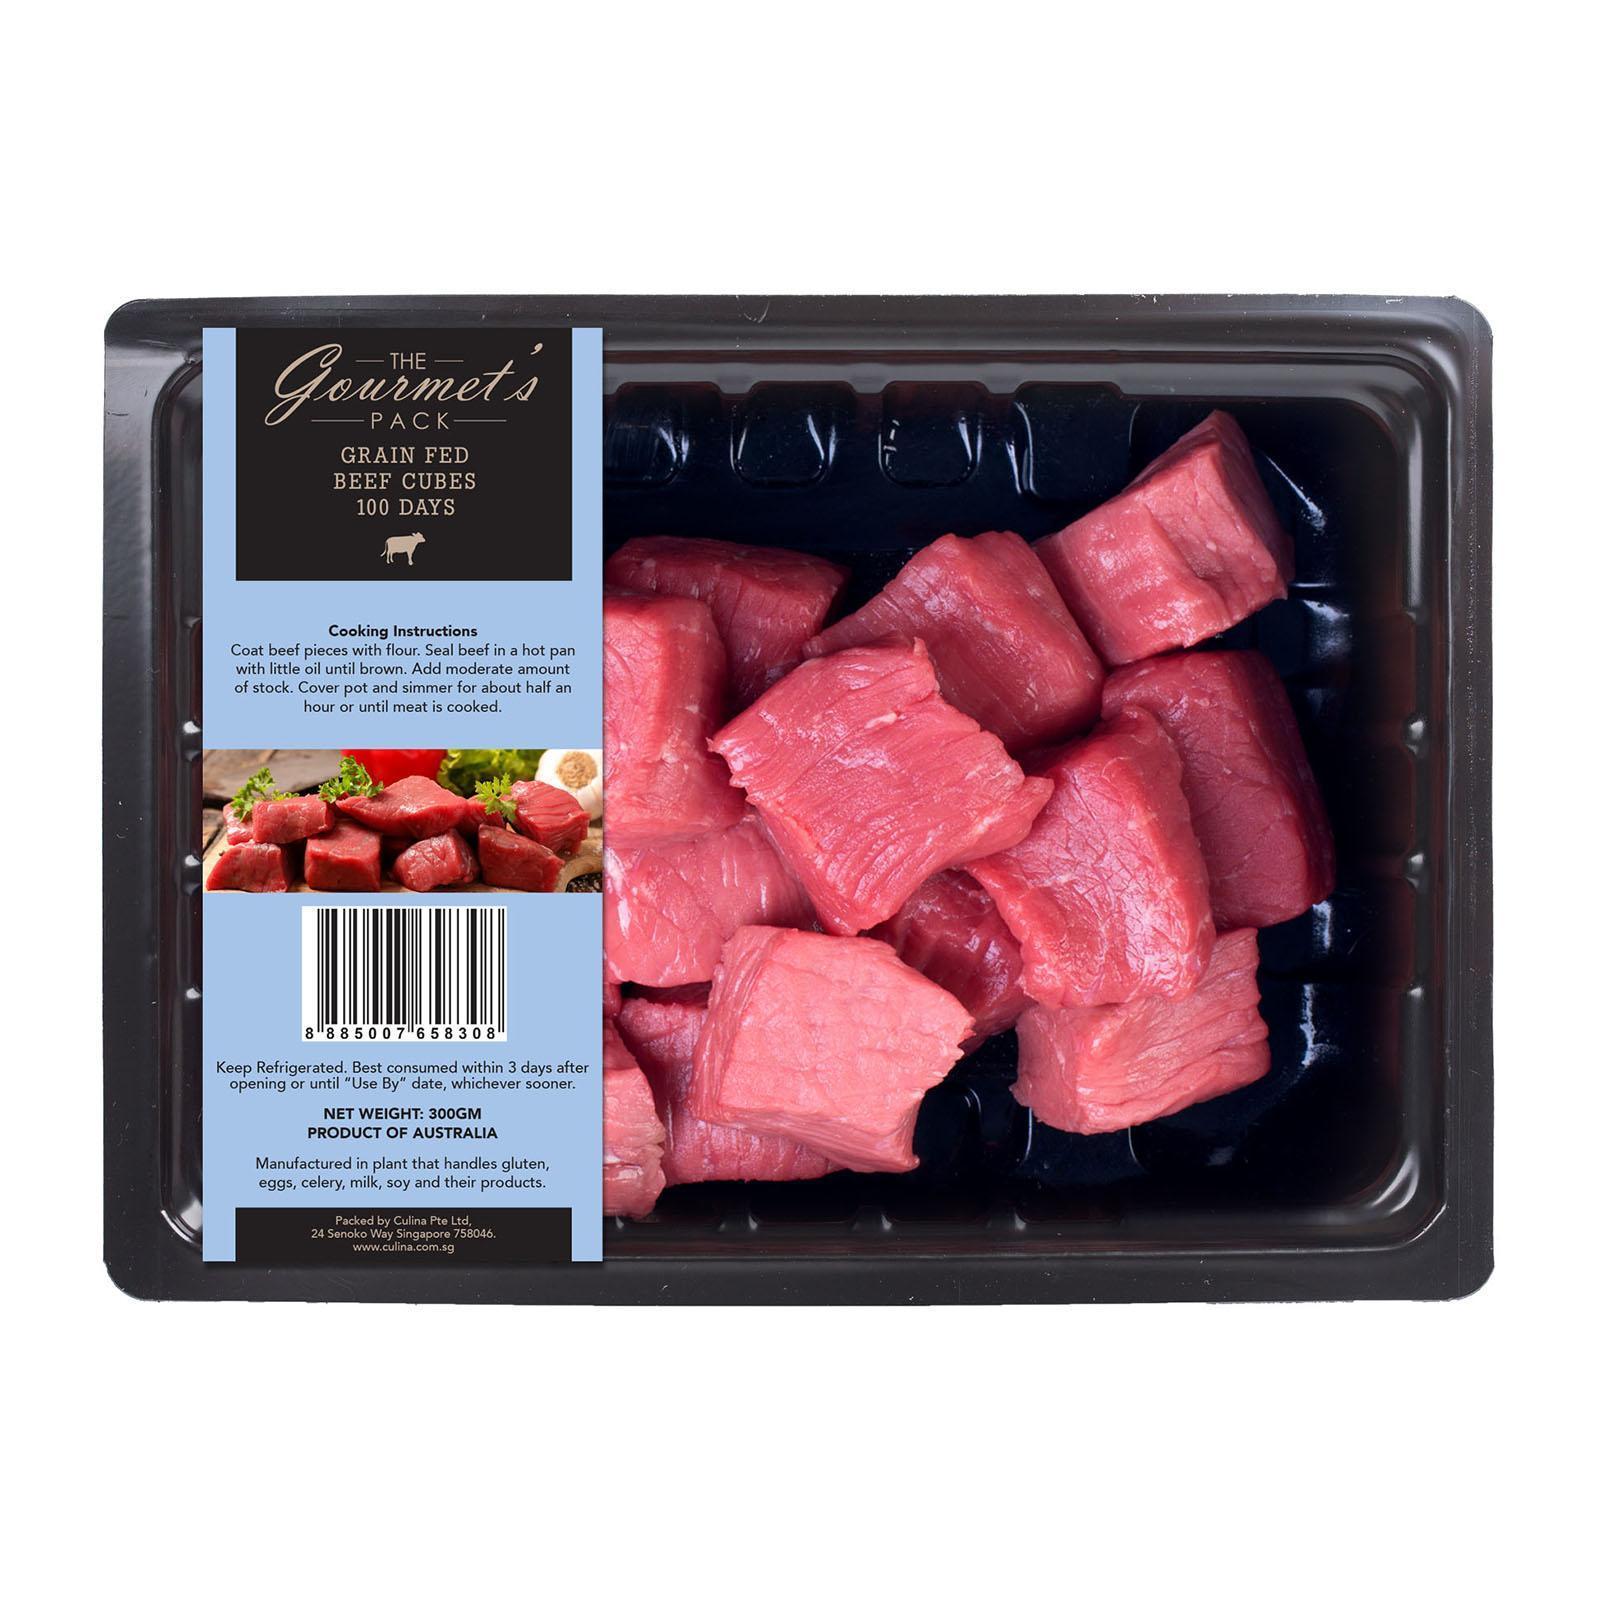 The Gourmet's Pack Grain Fed Beef Cubes - Australia